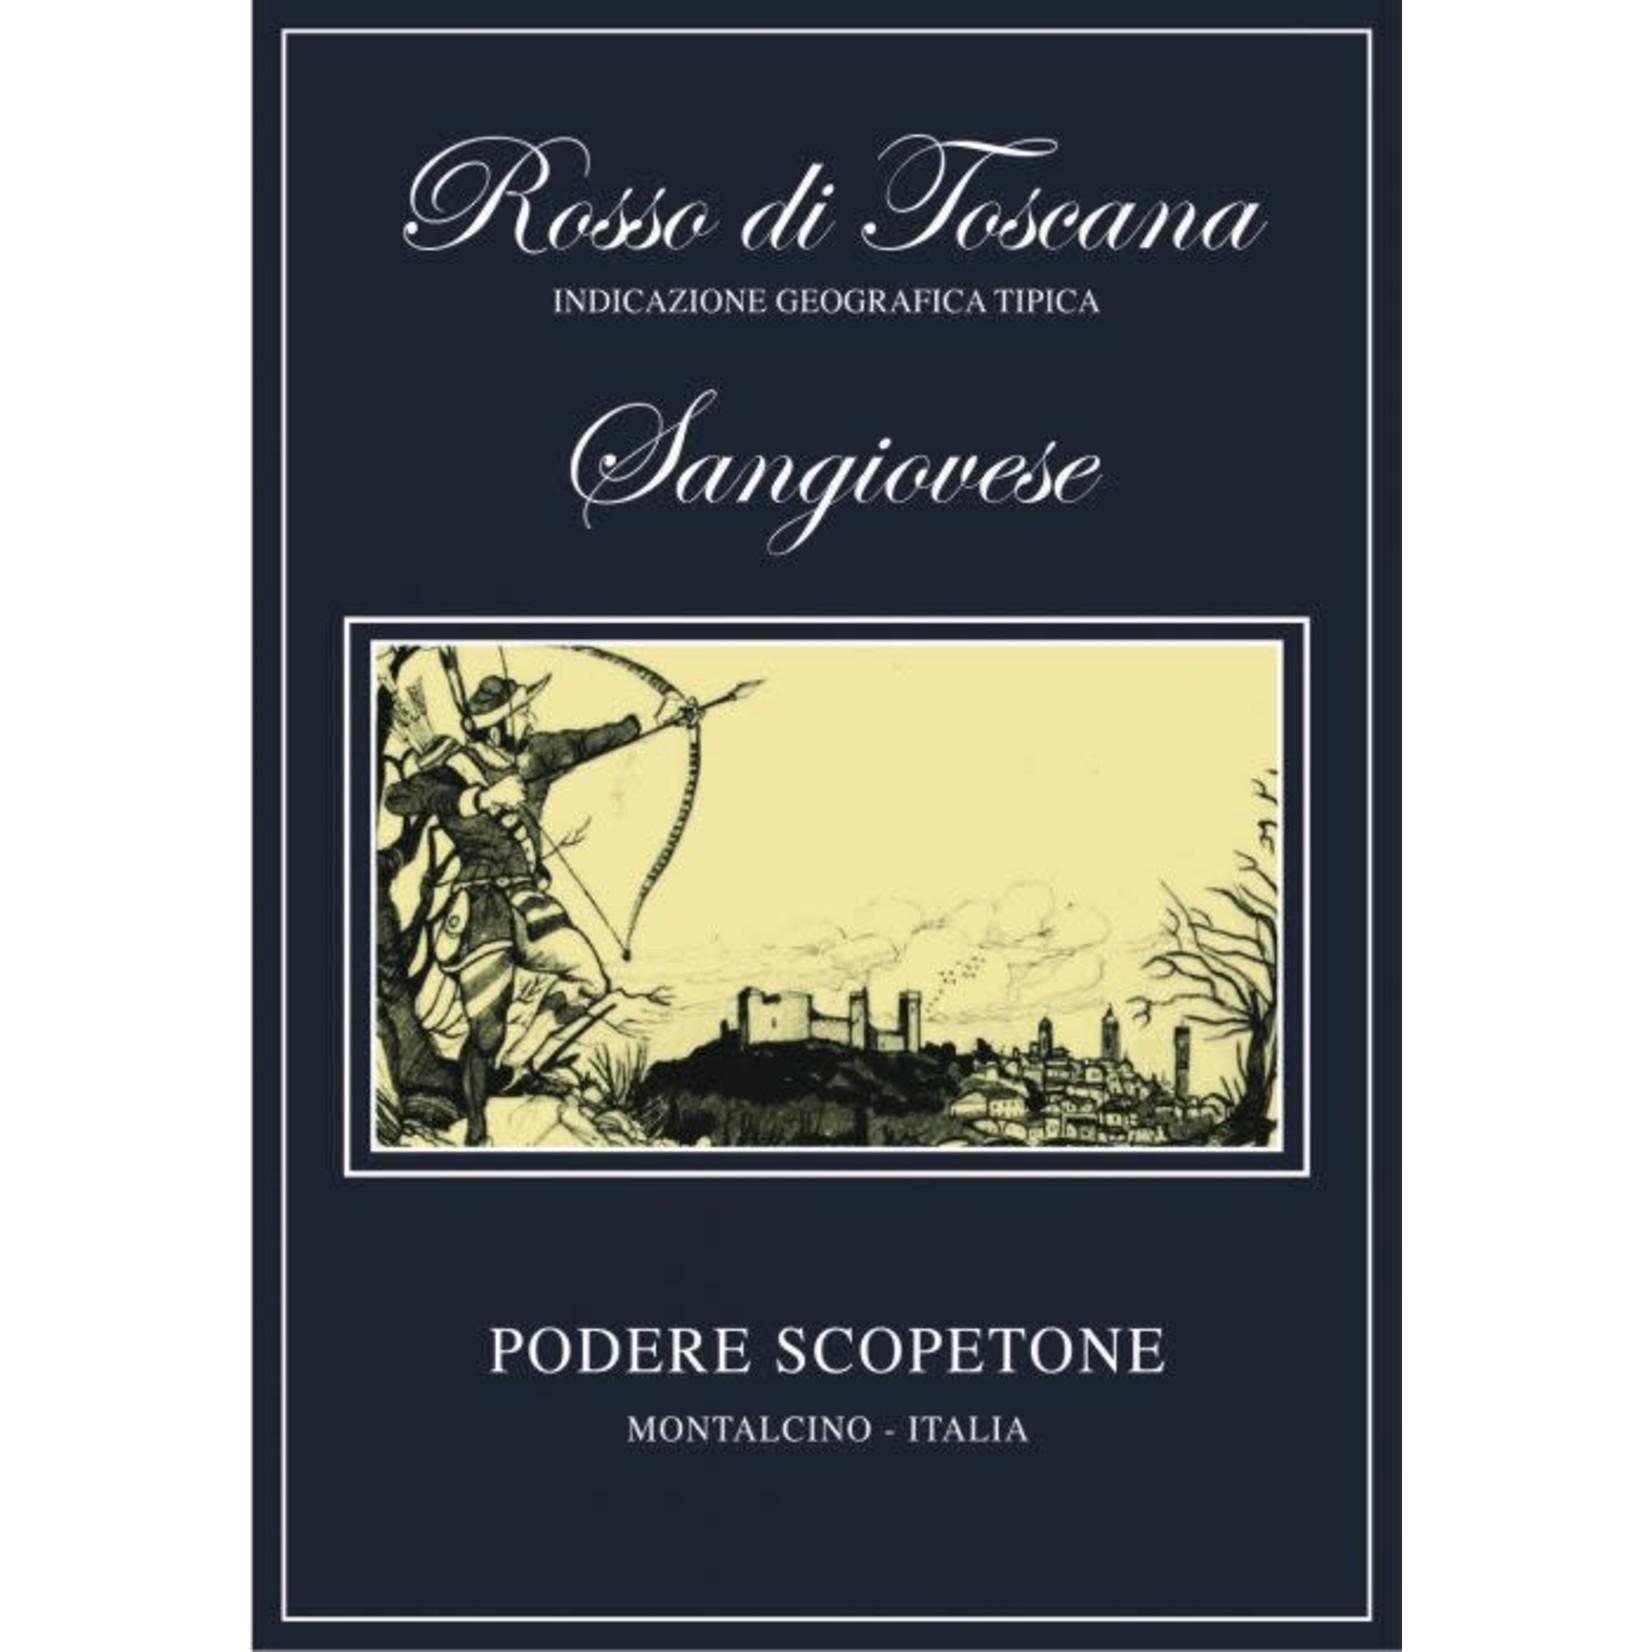 Wine Scopetone Toscana di Sangiovese 2018